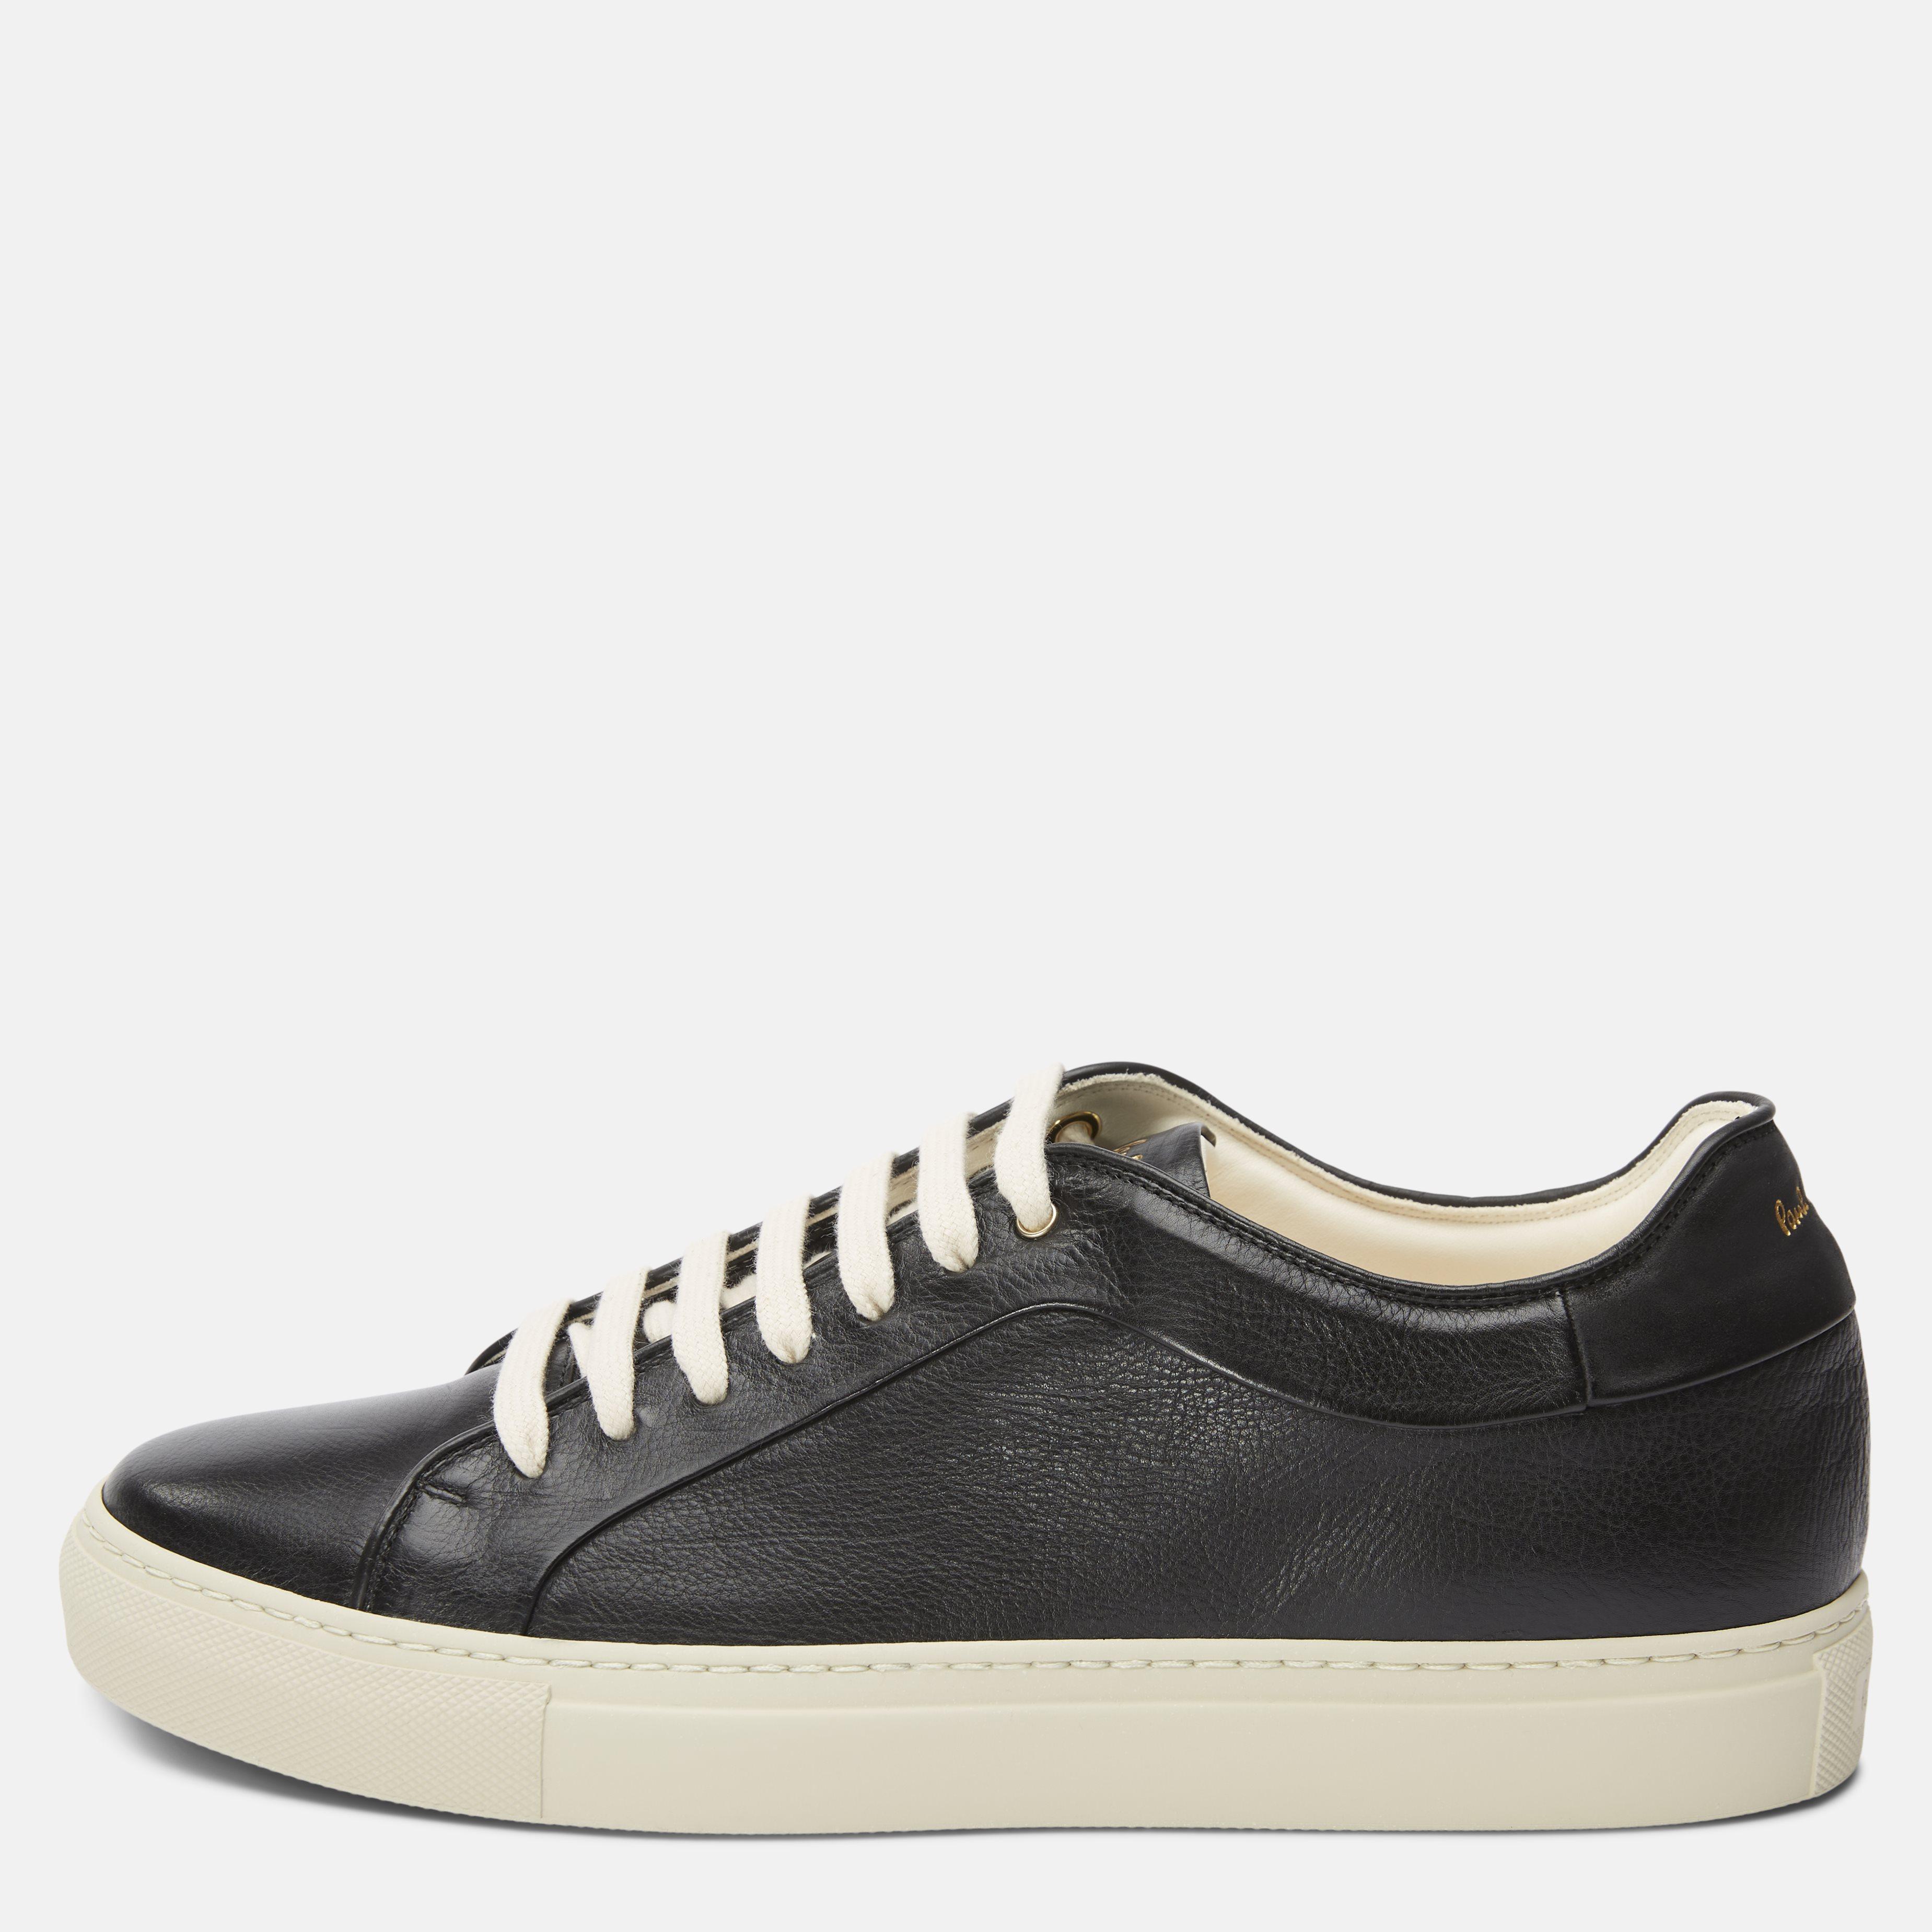 Sneakers - Sko - Sort